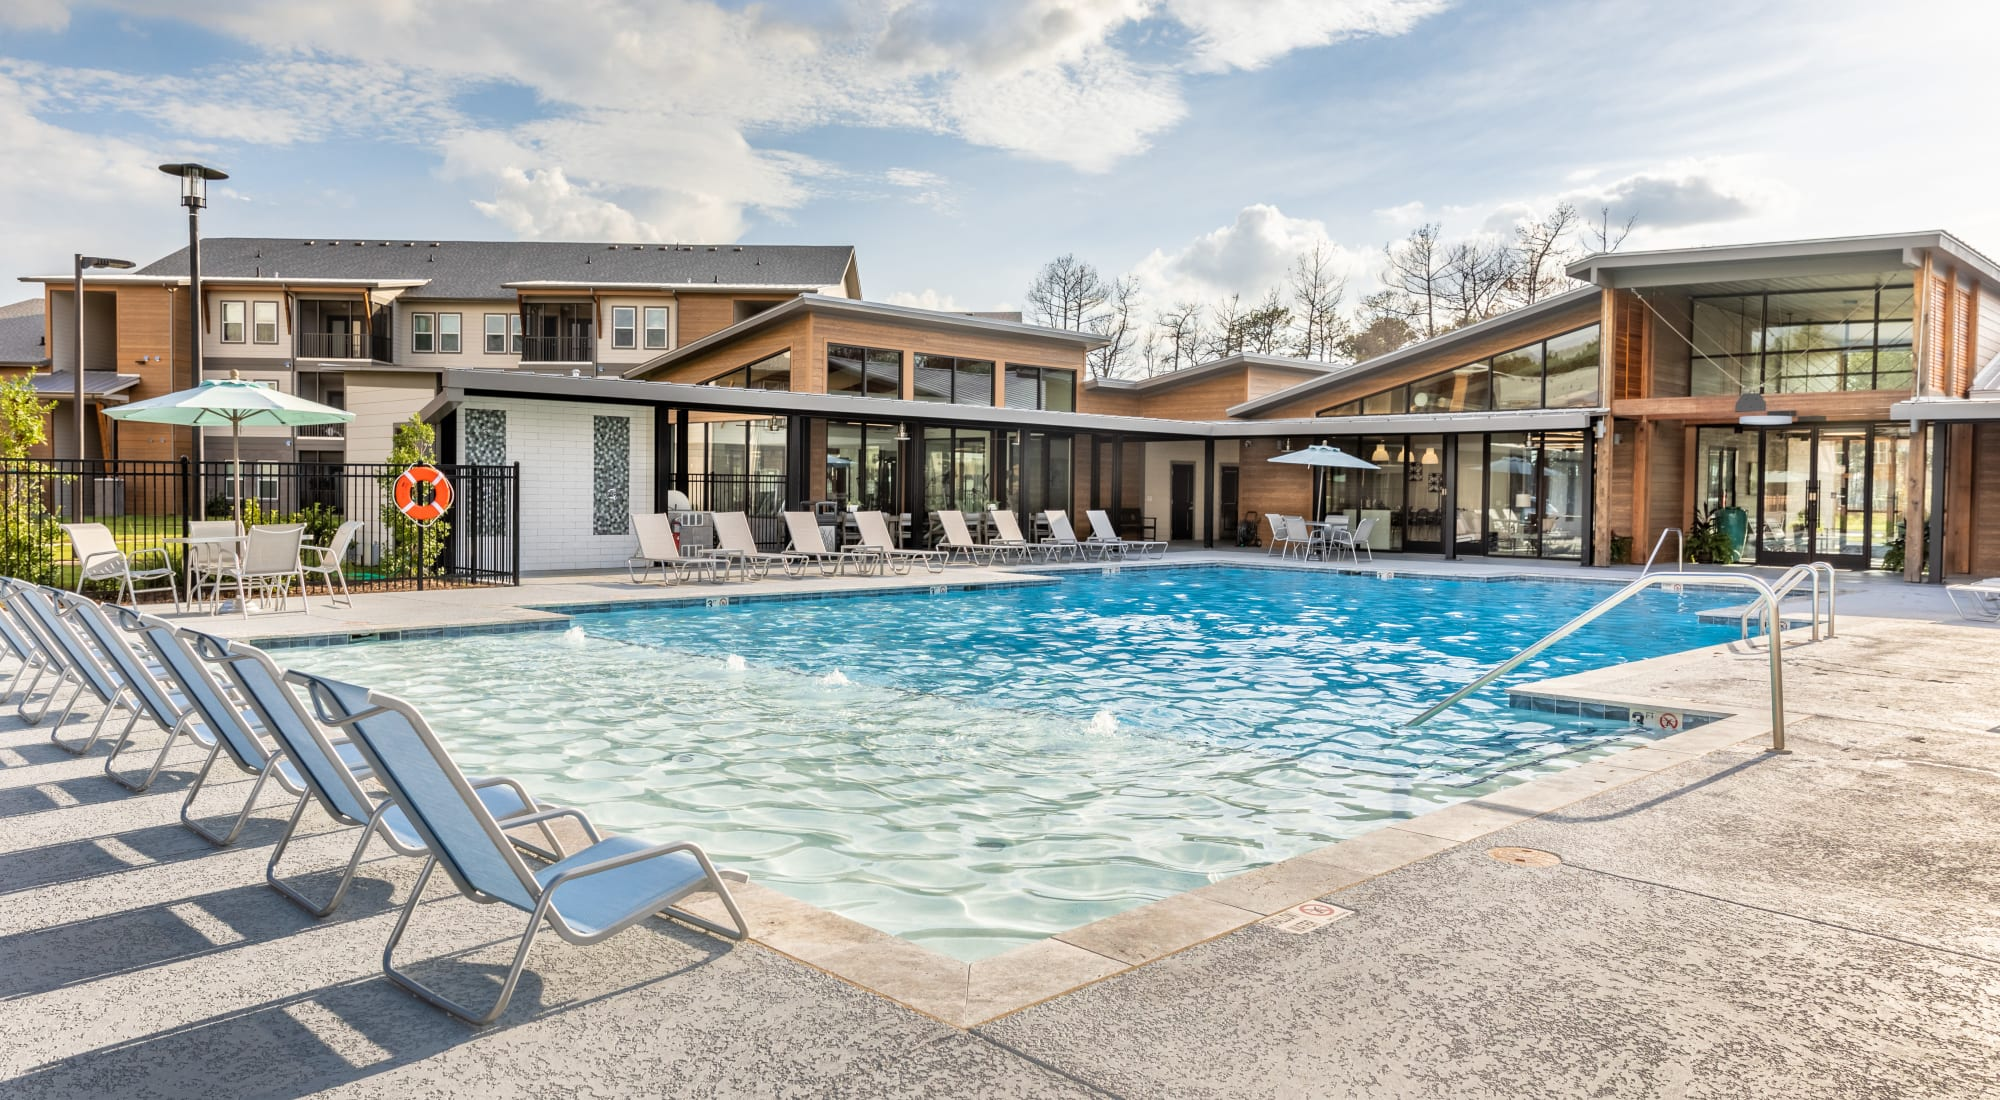 Apartments at Villa Westlake in Westlake, Louisiana